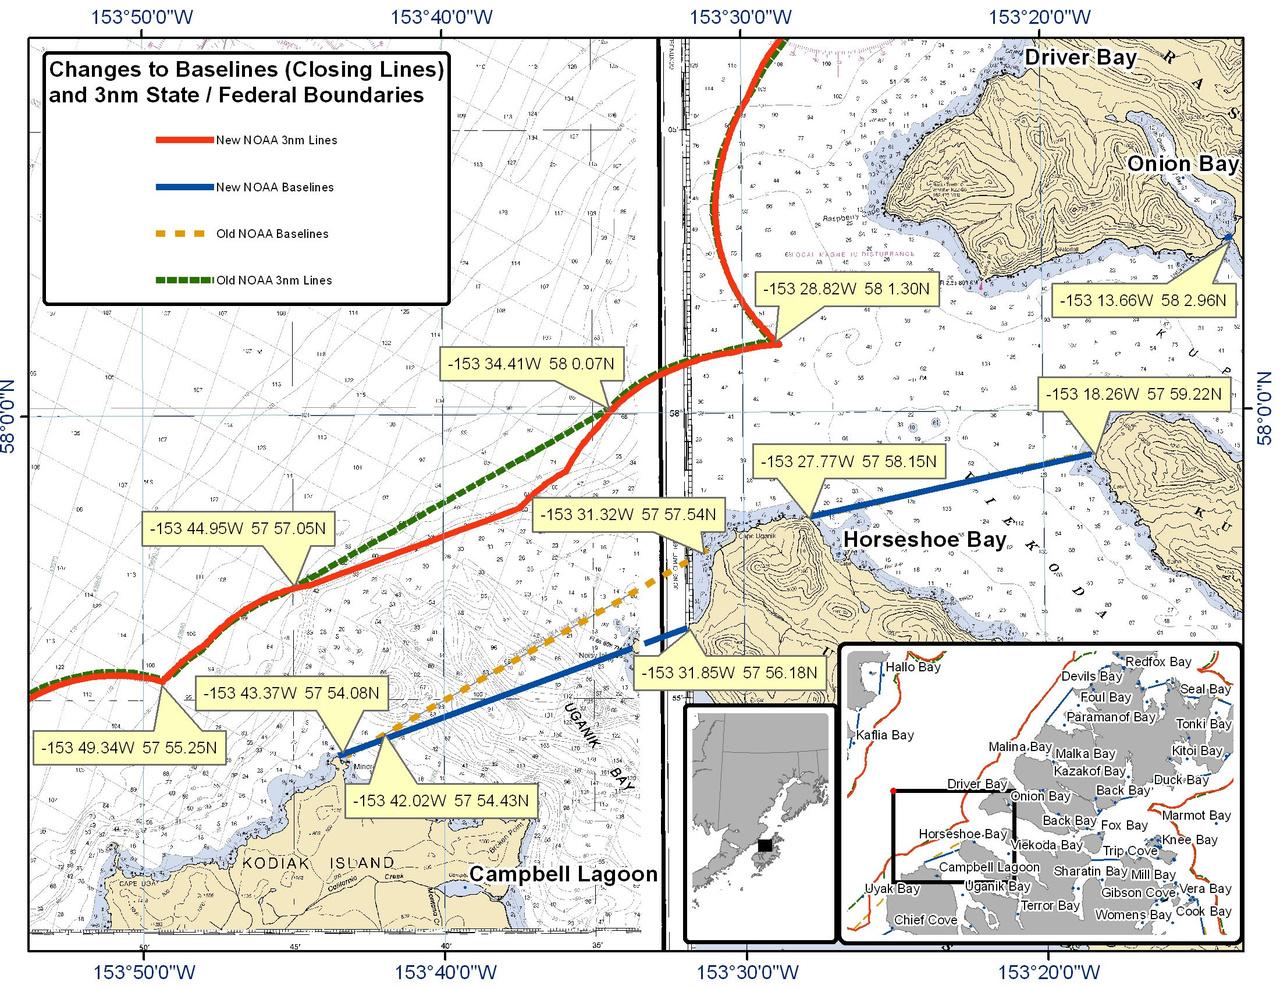 Chart Campbell Lagoon and Horseshoe Bay